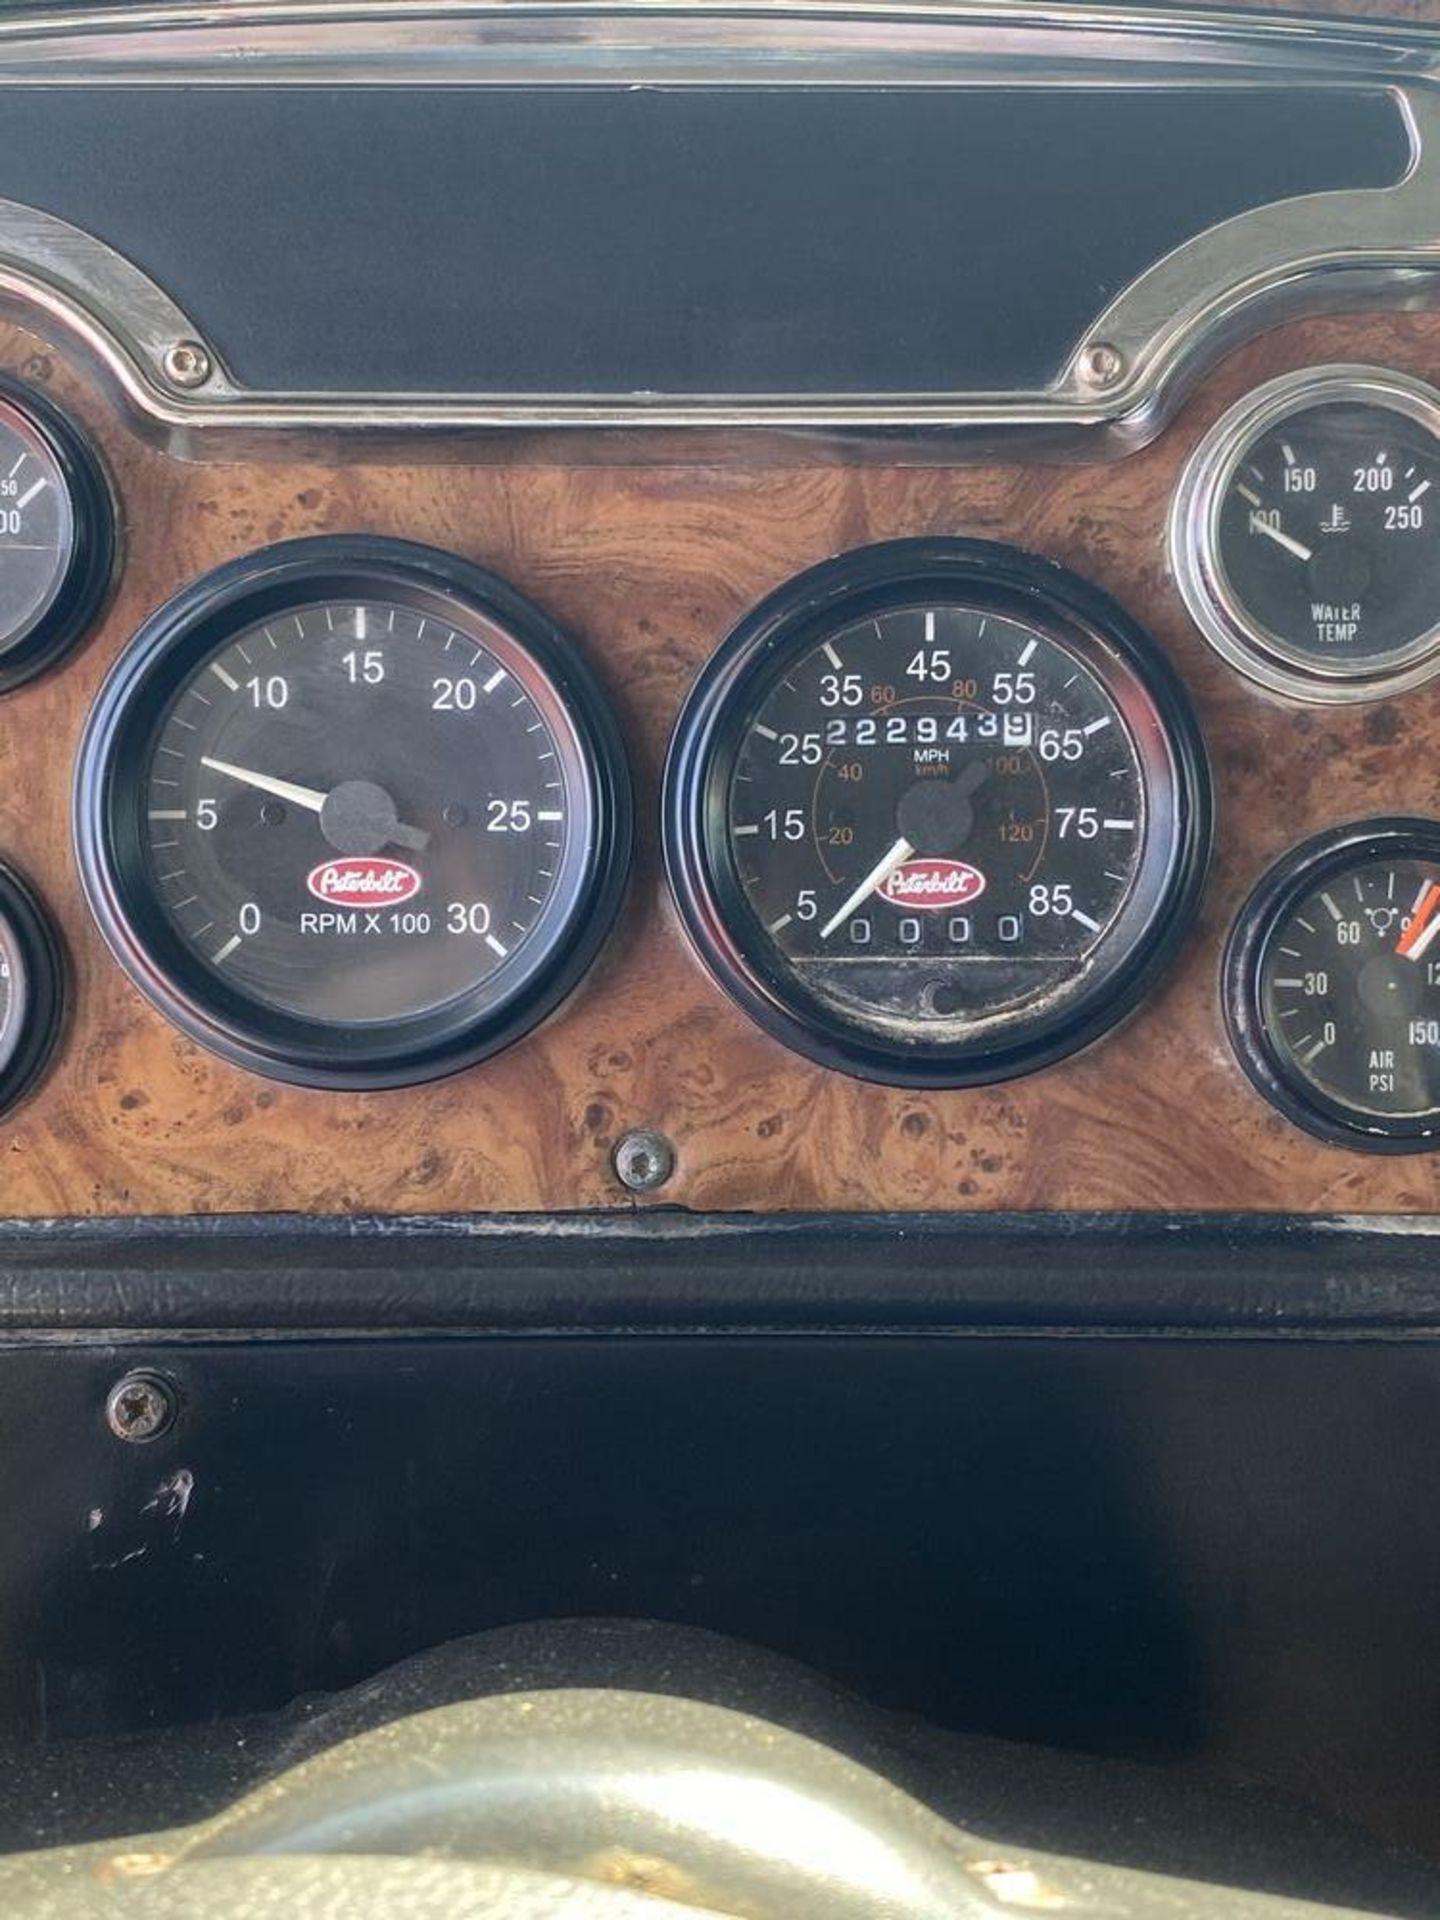 2001 Peterbilt 379 - Image 17 of 30